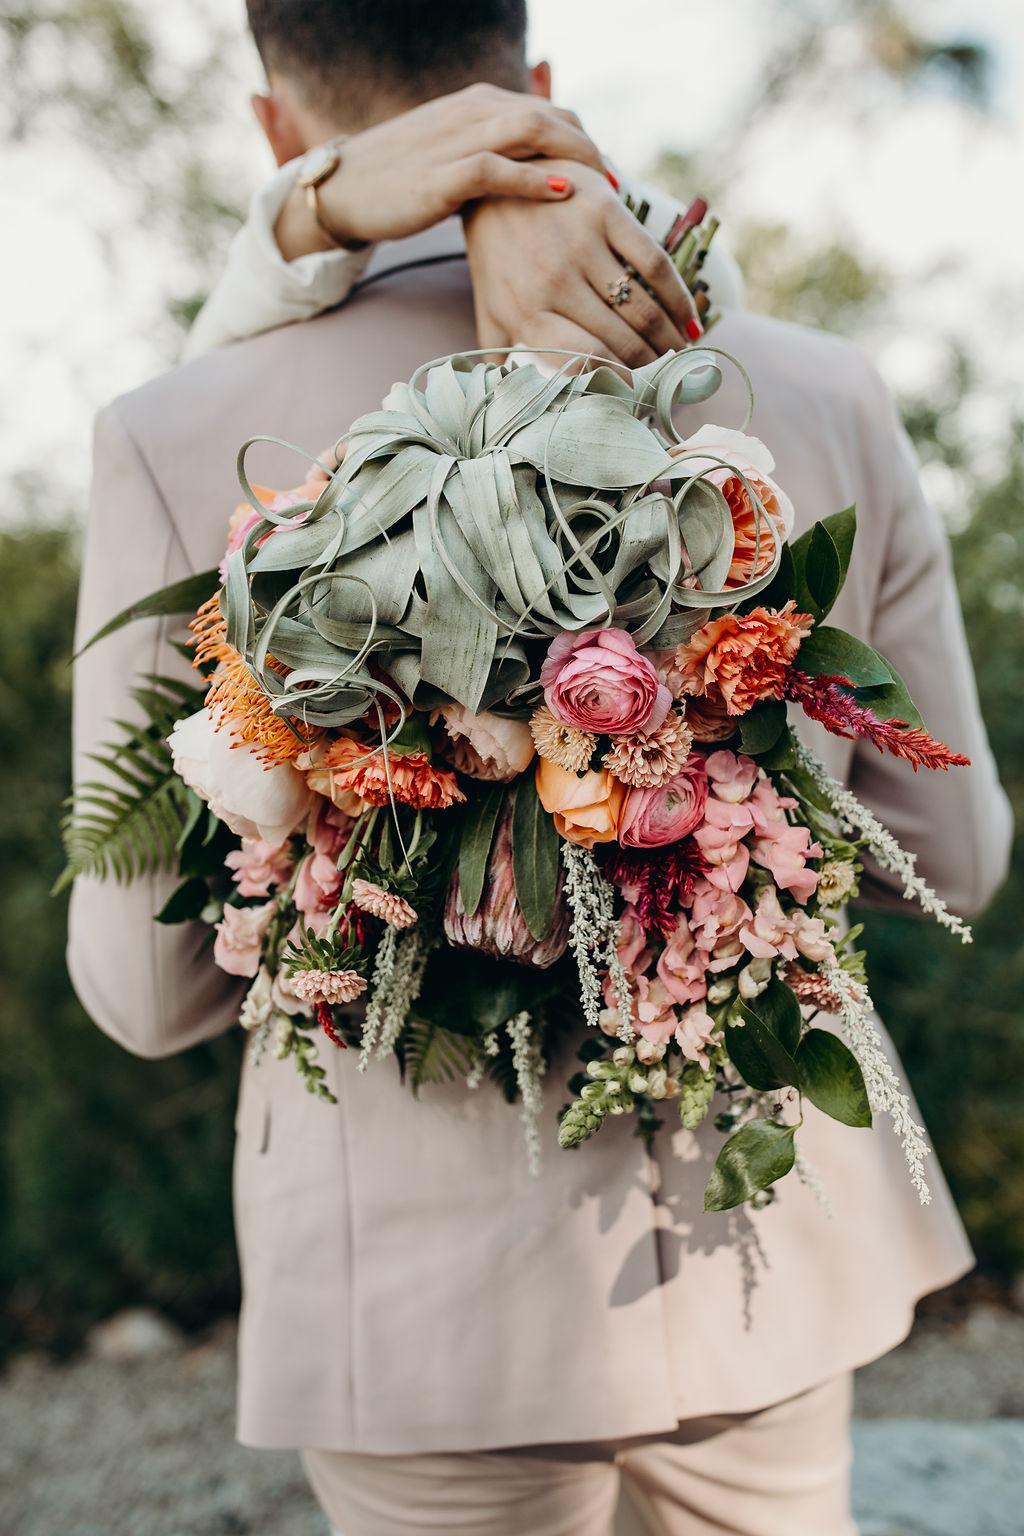 love-fern-design-studio-custom-wedding-invitations-for-the-modern-couple-modern-calligraphy-in-seattle-washington-custom-wedding-stationery-neon-acrylic-eclectic-alice-wonderland-wedding-bride-flowers